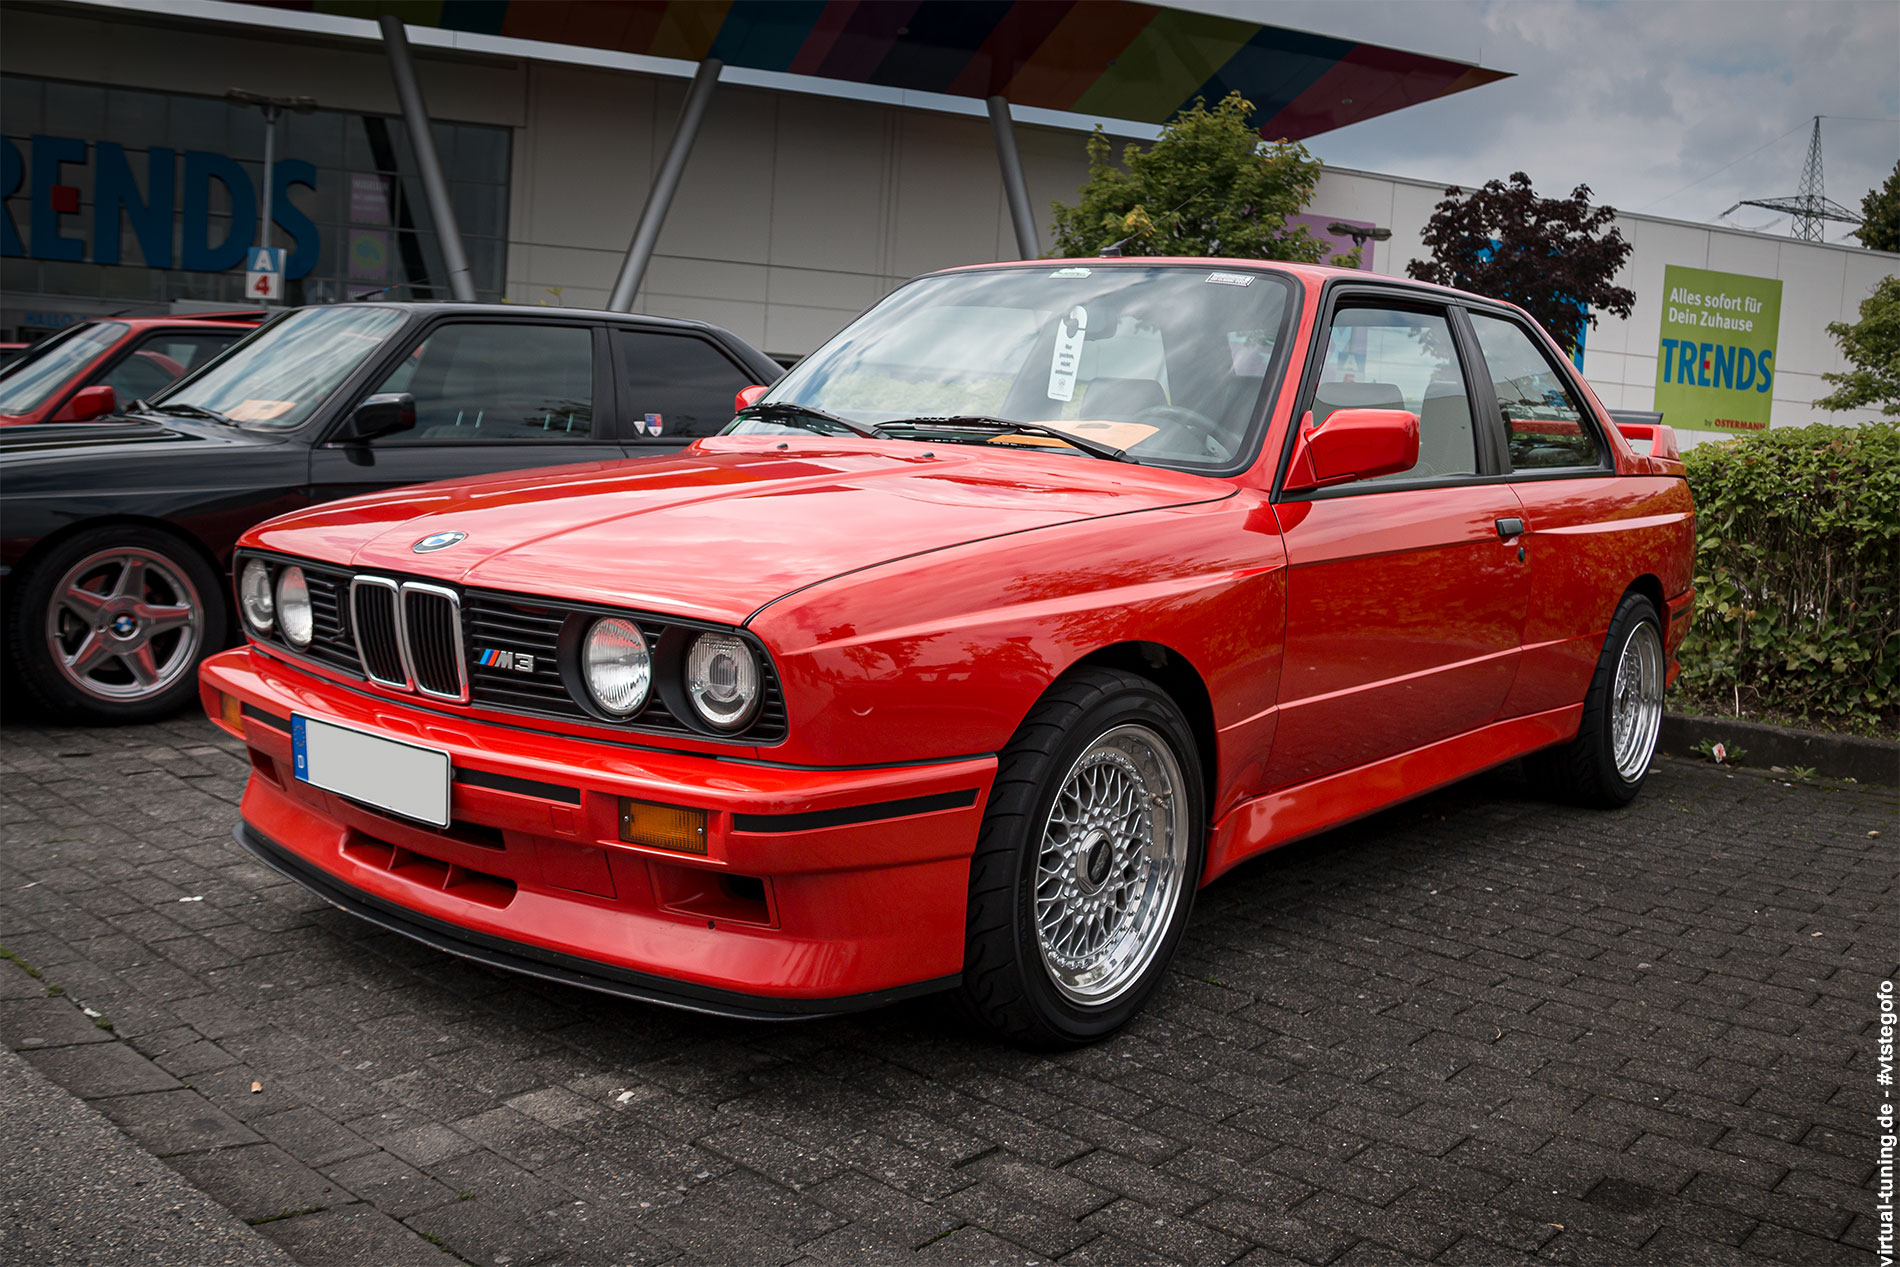 BMW E30 M3 - 2. ADAC Youngtimertreffen-Ruhr (08.2017)